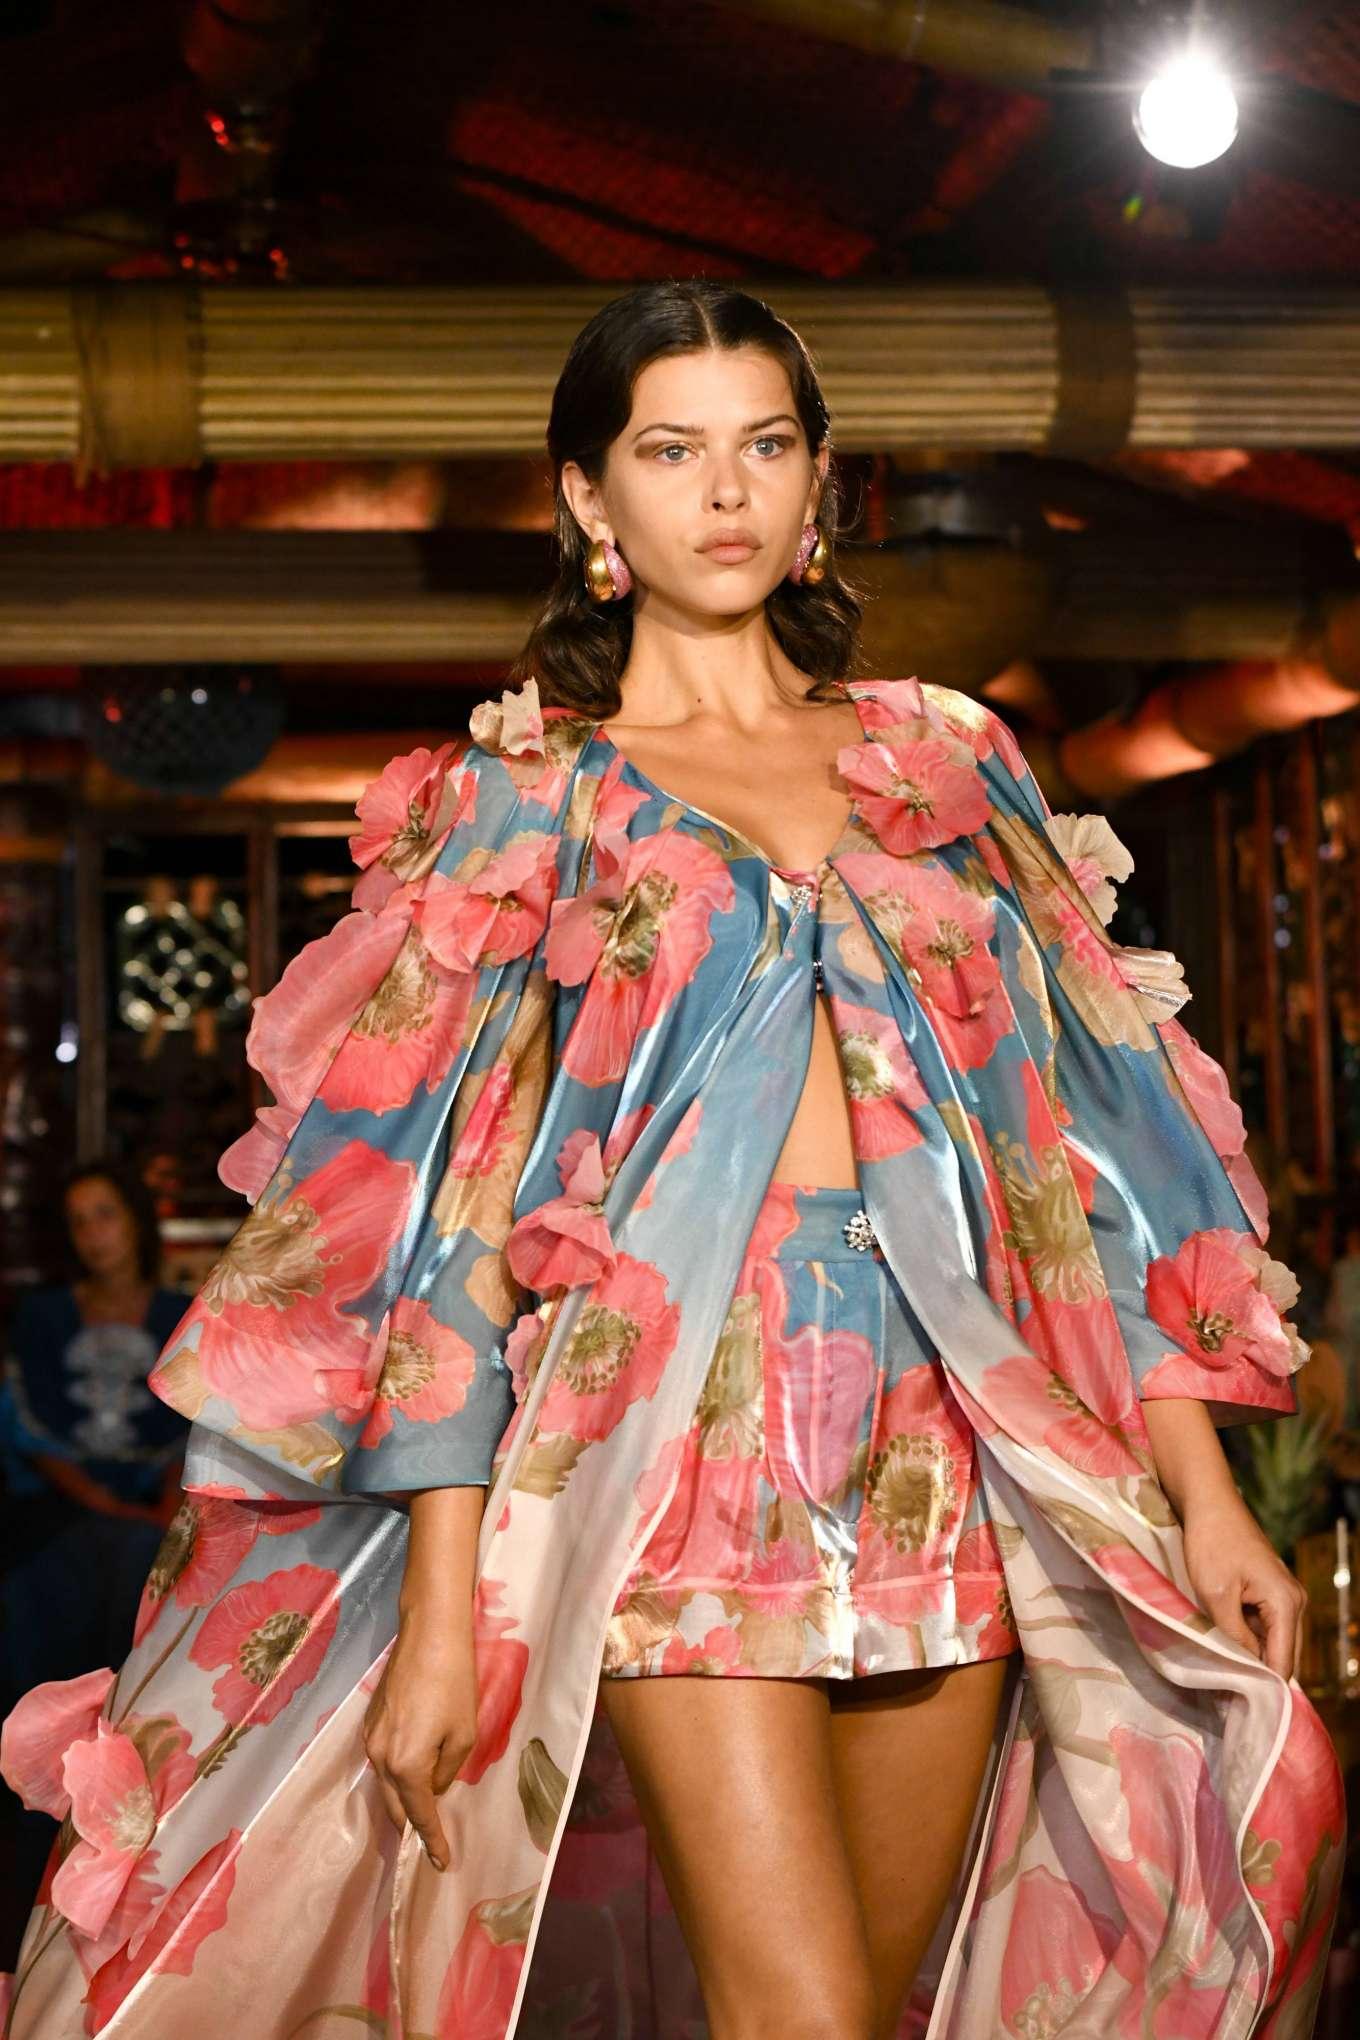 Georgia Fowler See Through At Milan Fashion Week - Hot And